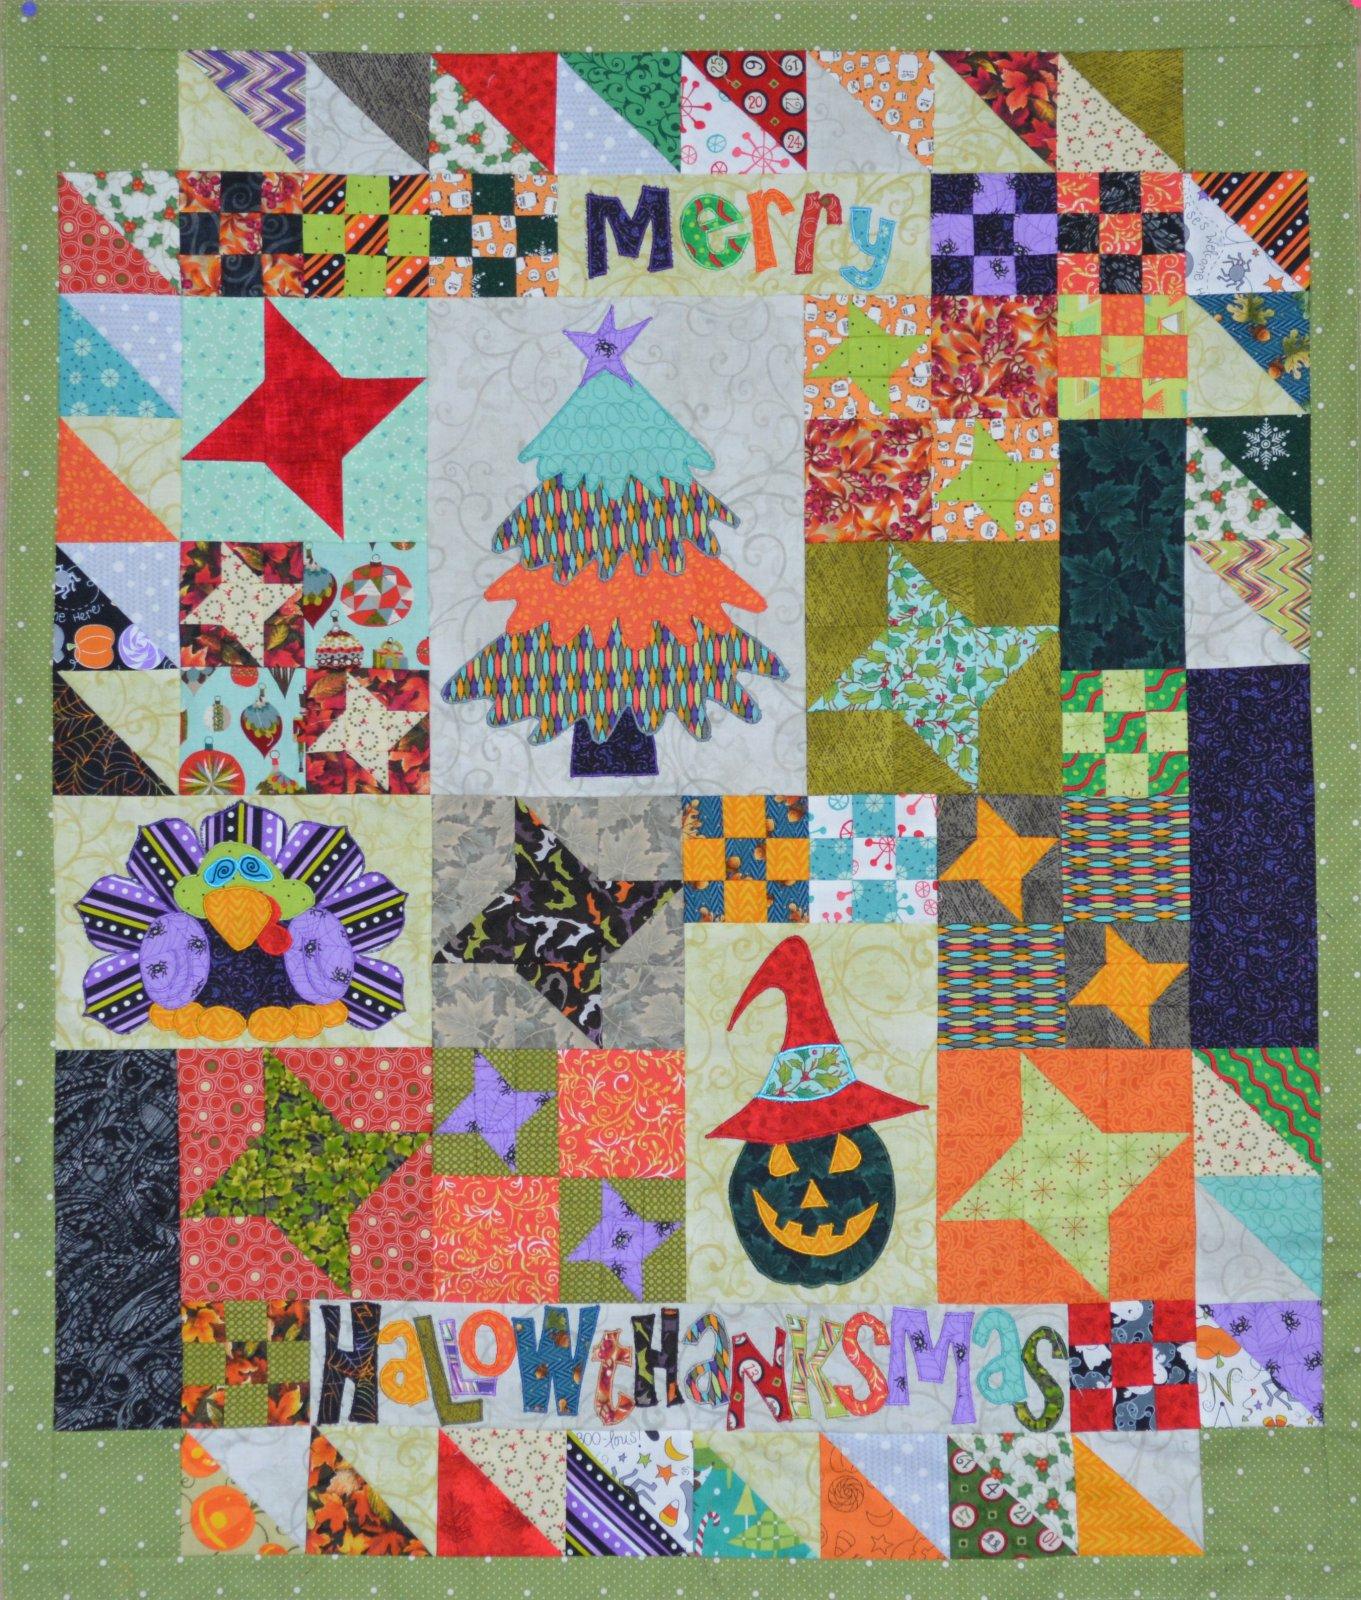 Merry Hallowthanksmas Pattern